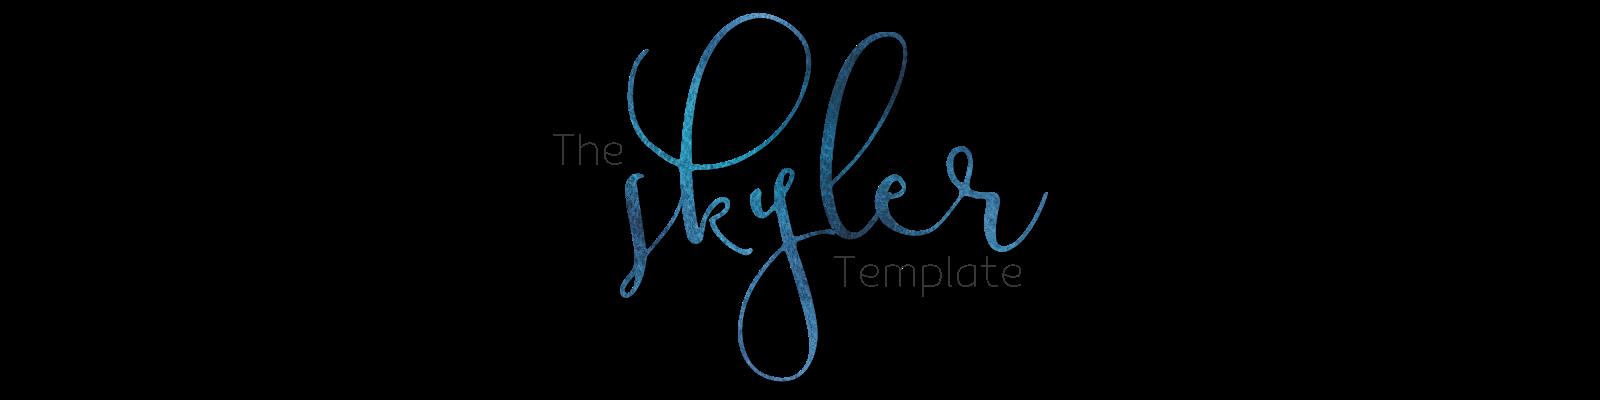 The Skyler Template